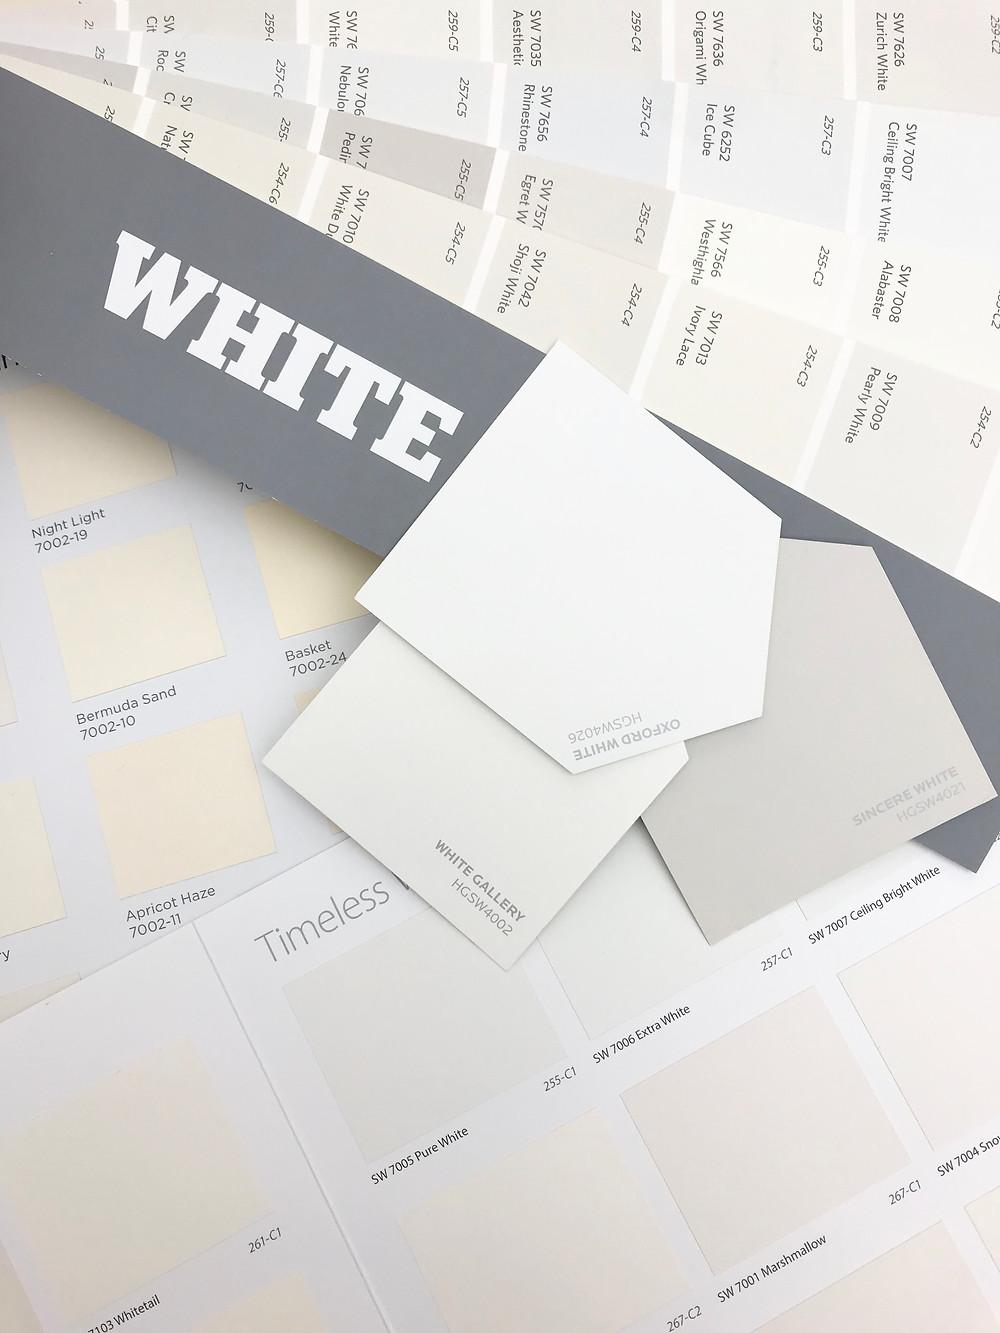 White paint samples